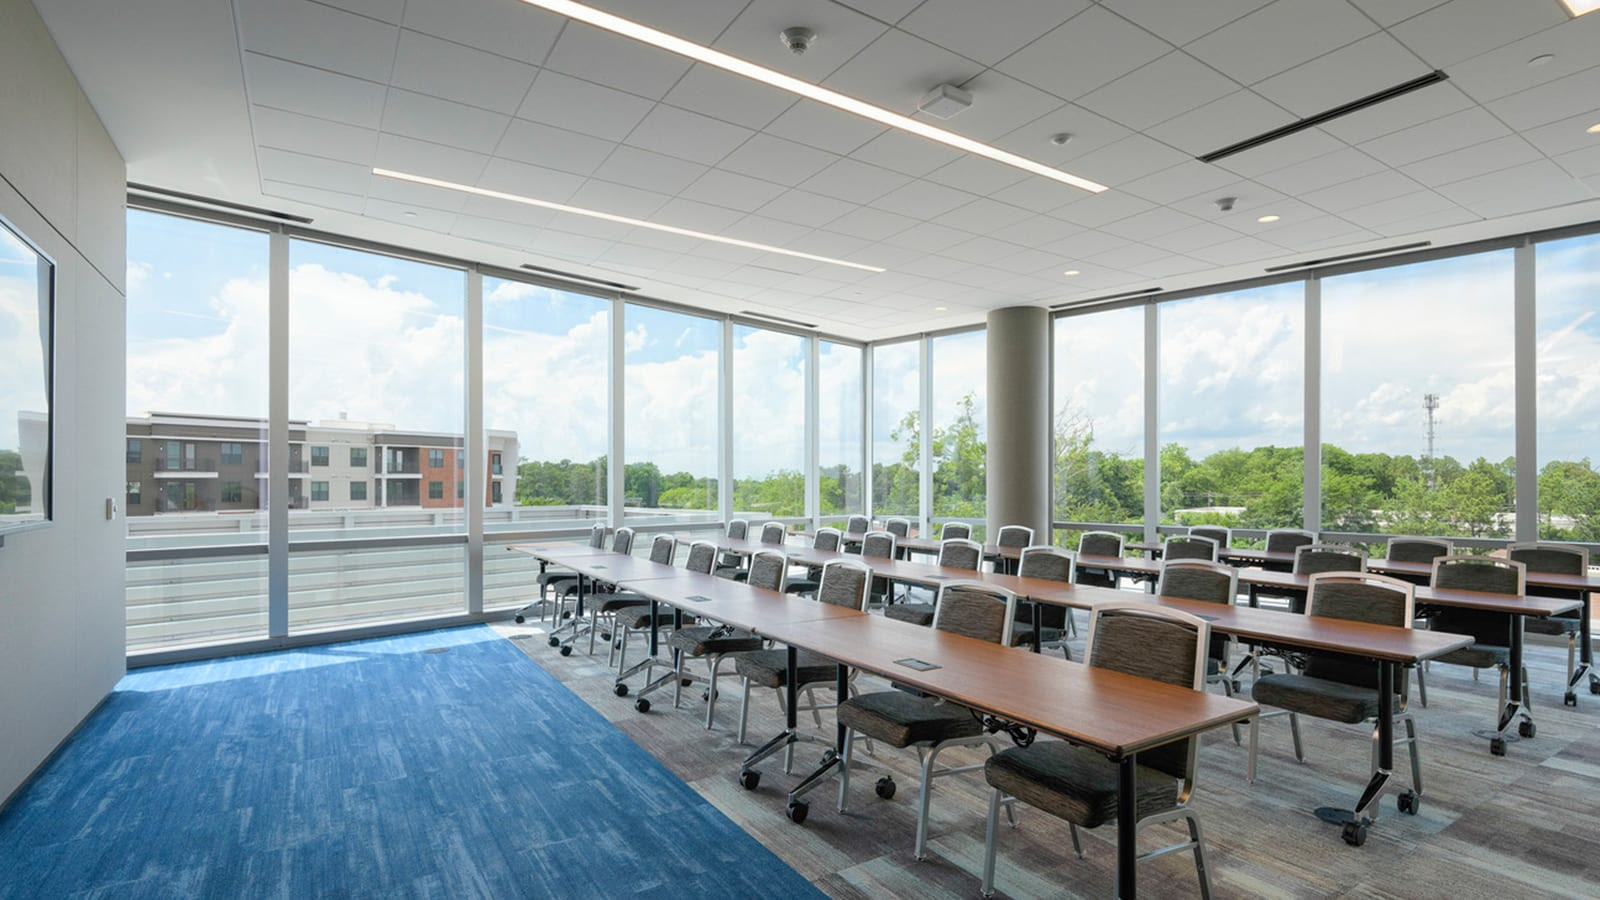 Sandy Springs City Center education space